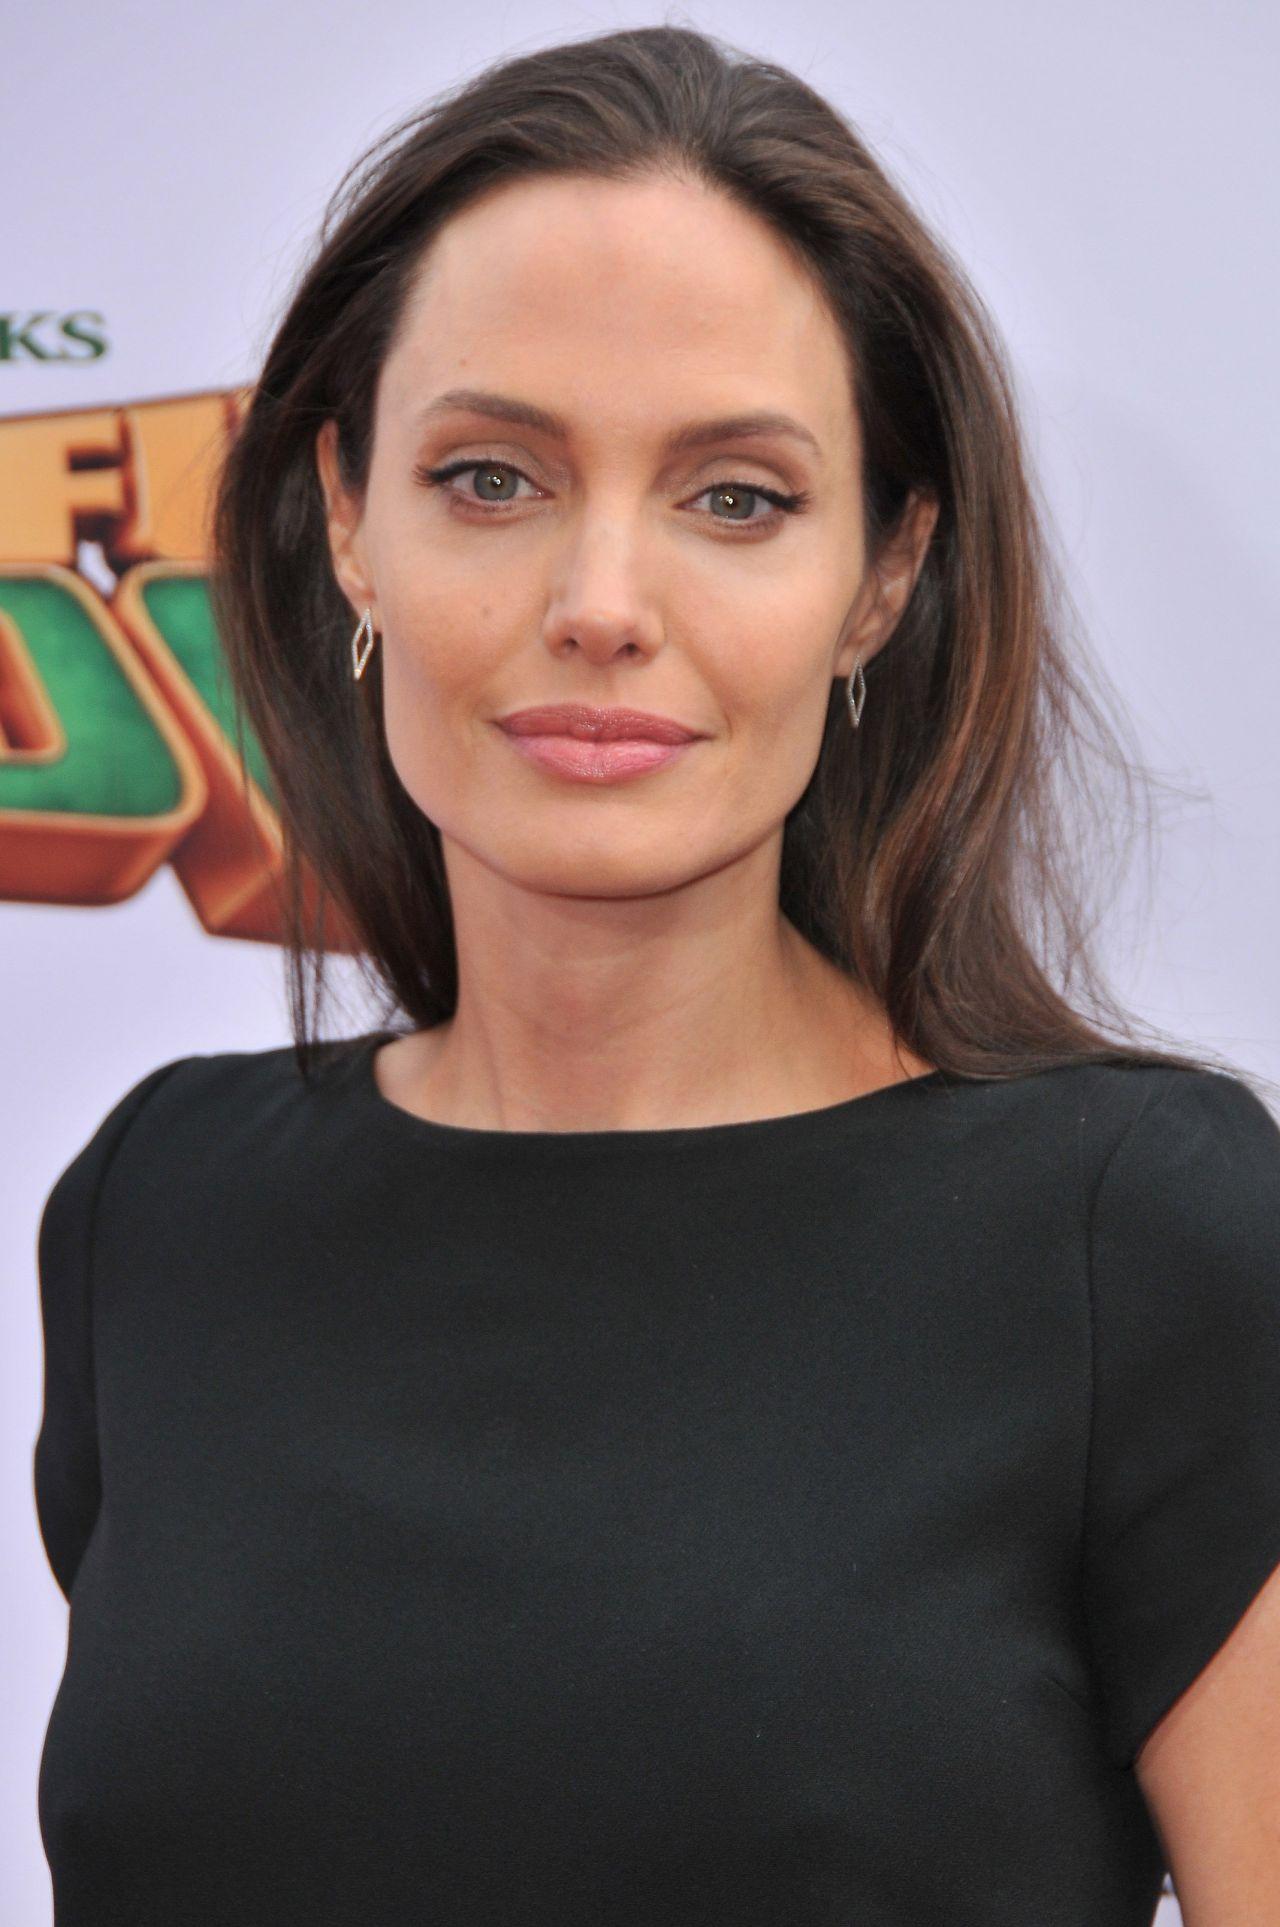 Angelina Jolie on Red Carpet – 'Kung Fu Panda 3' Premiere ... Angelina Jolie